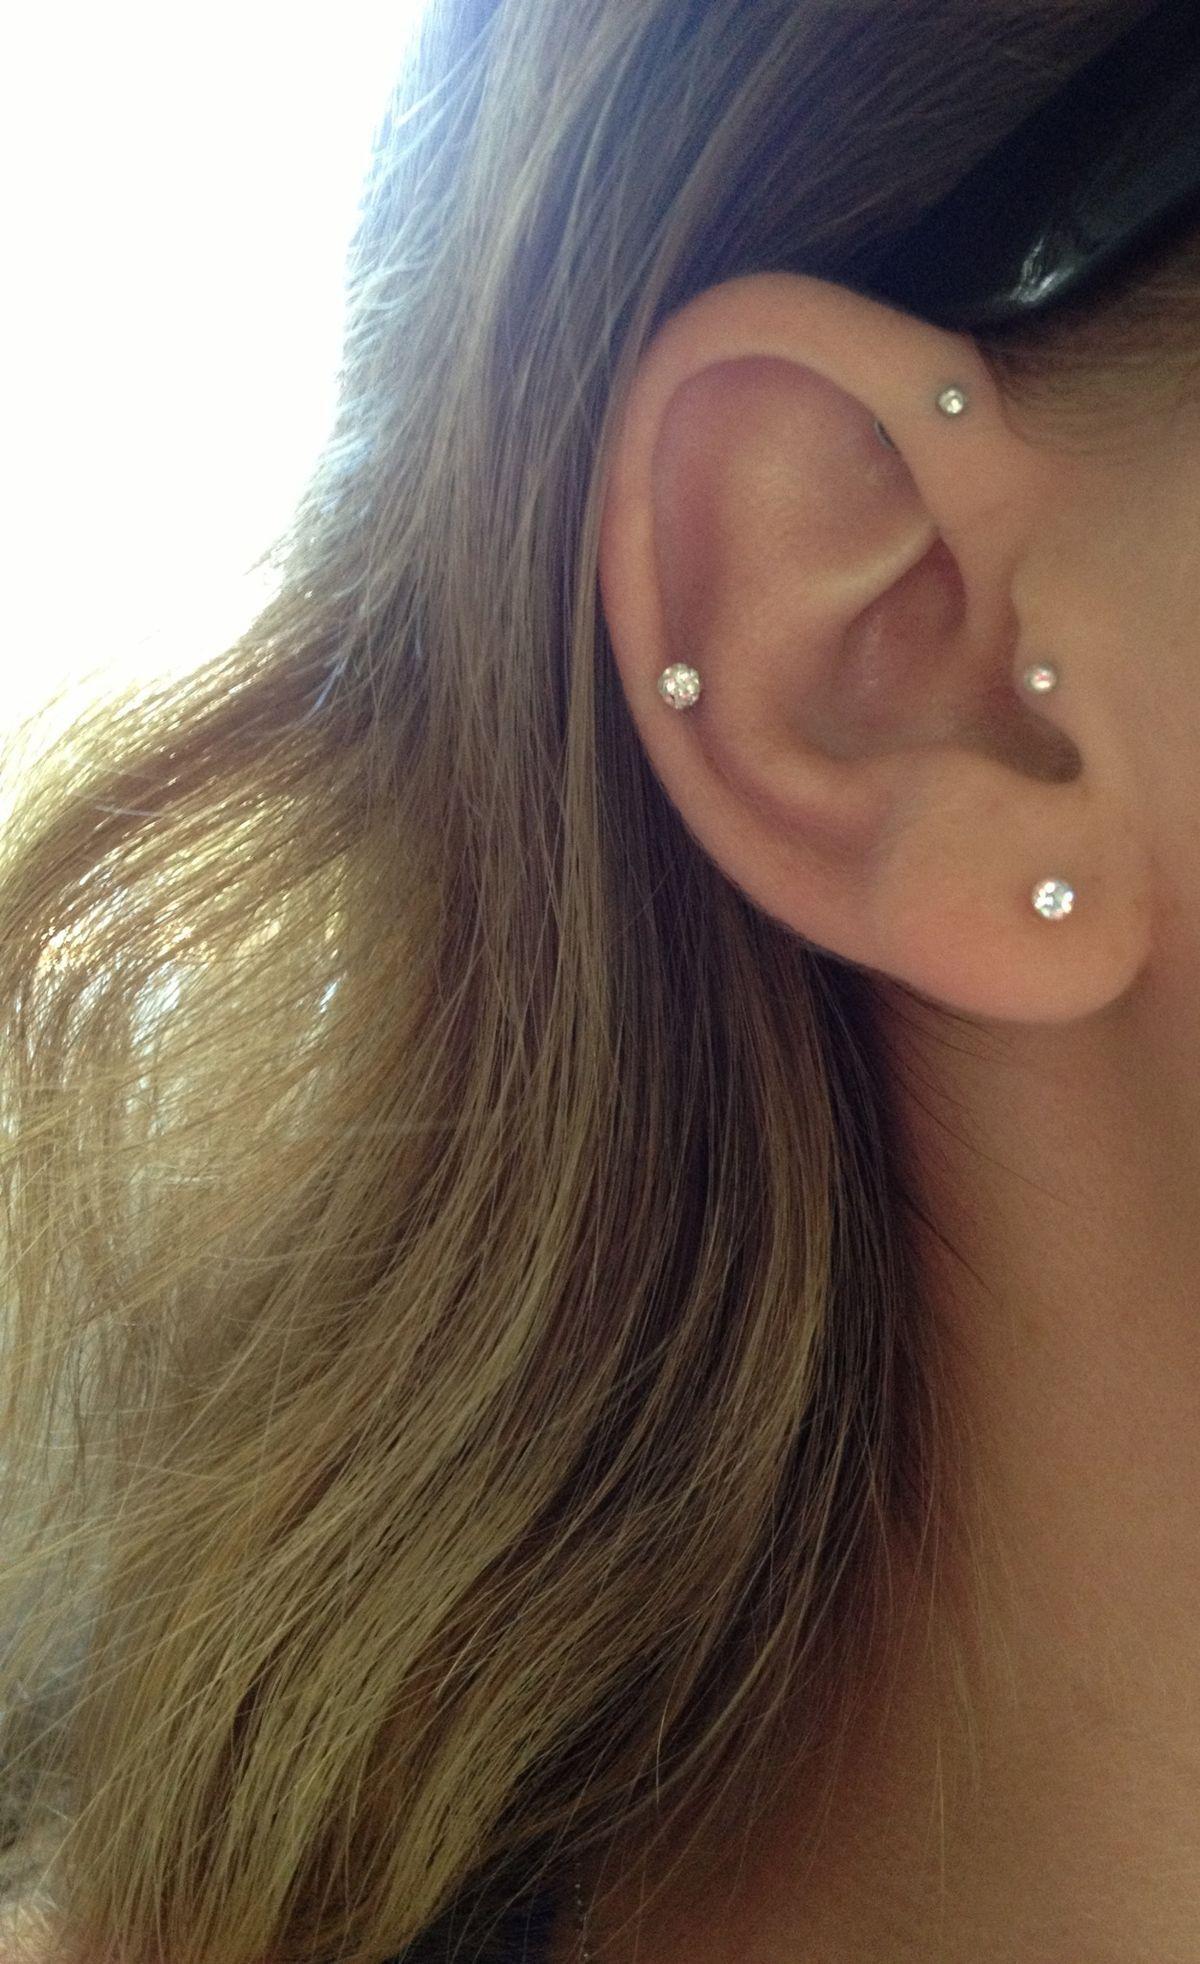 8cdbdea639be9c0318a961d8397a1e1fg 1,200×1,964 Pixels Auricle Piercingear  Piercings Cartilageforward Helix